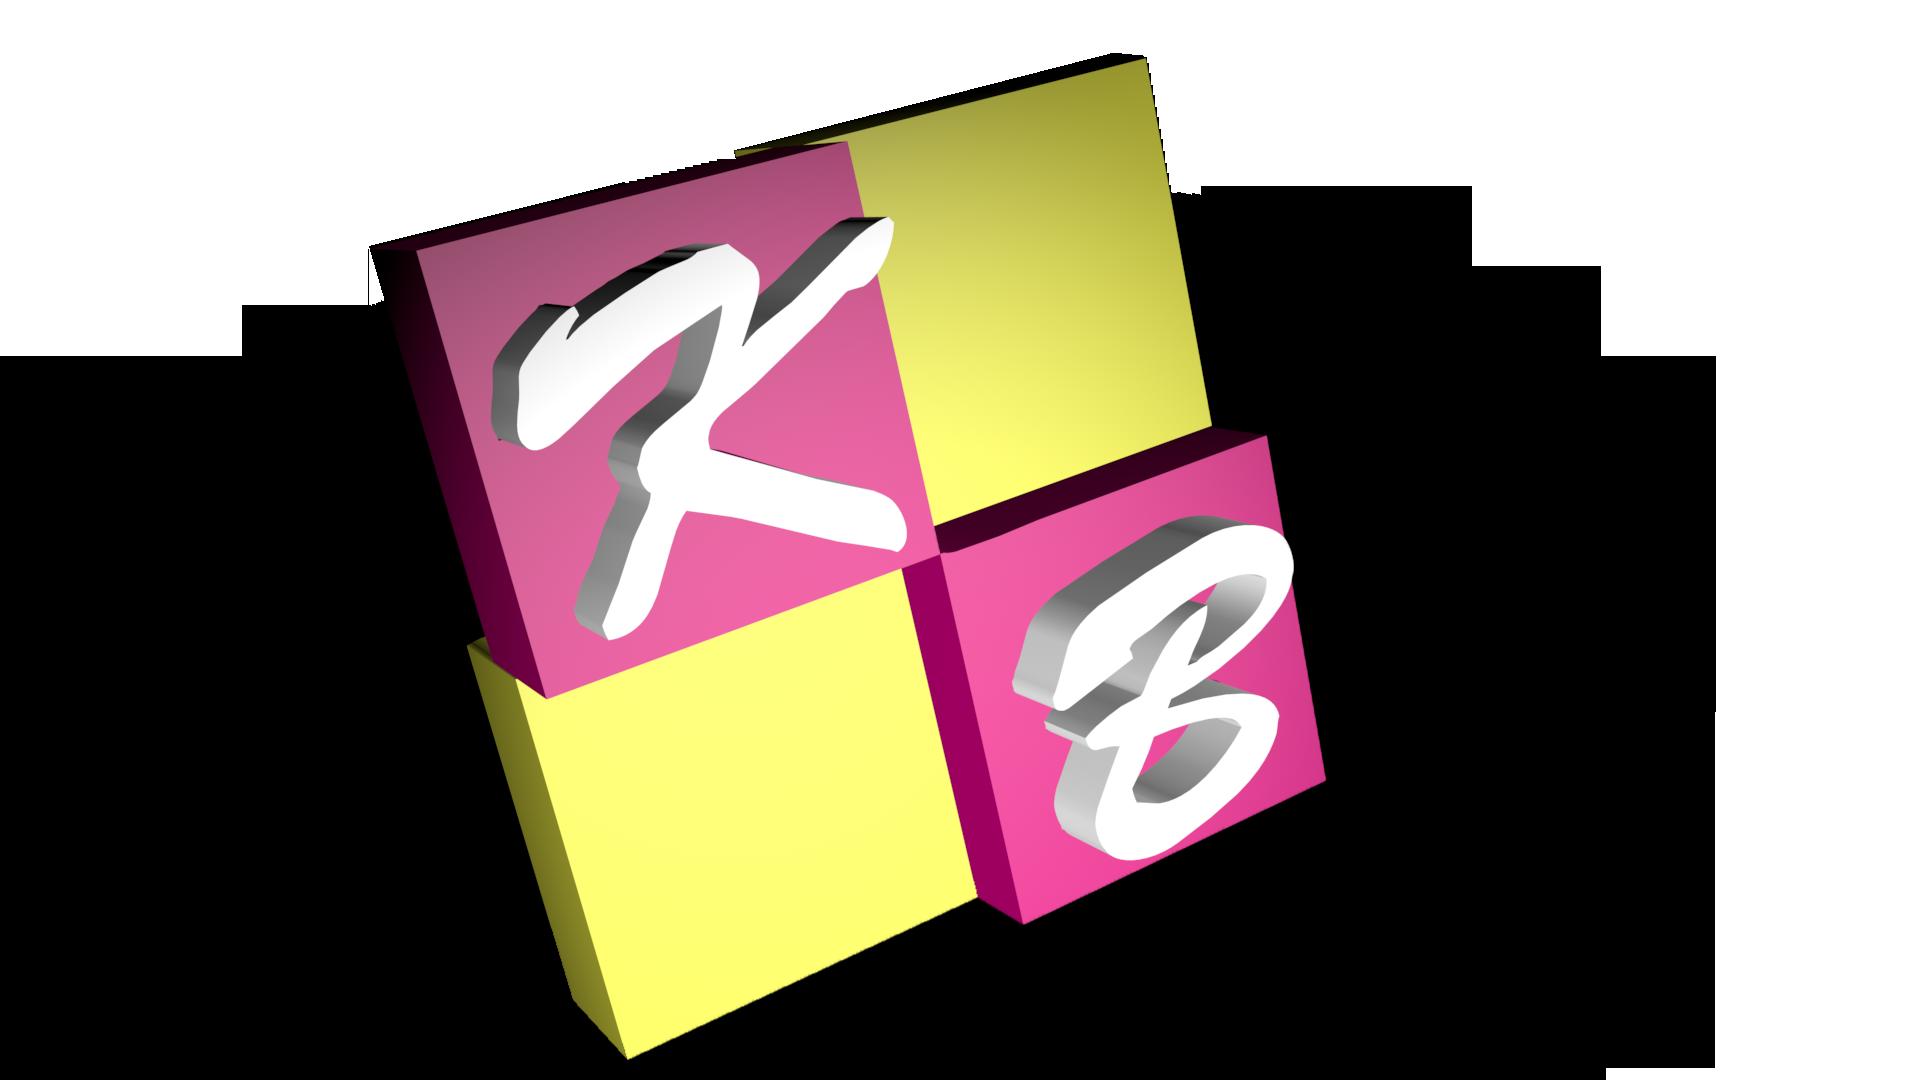 Logo KB Publicidad, S.L.